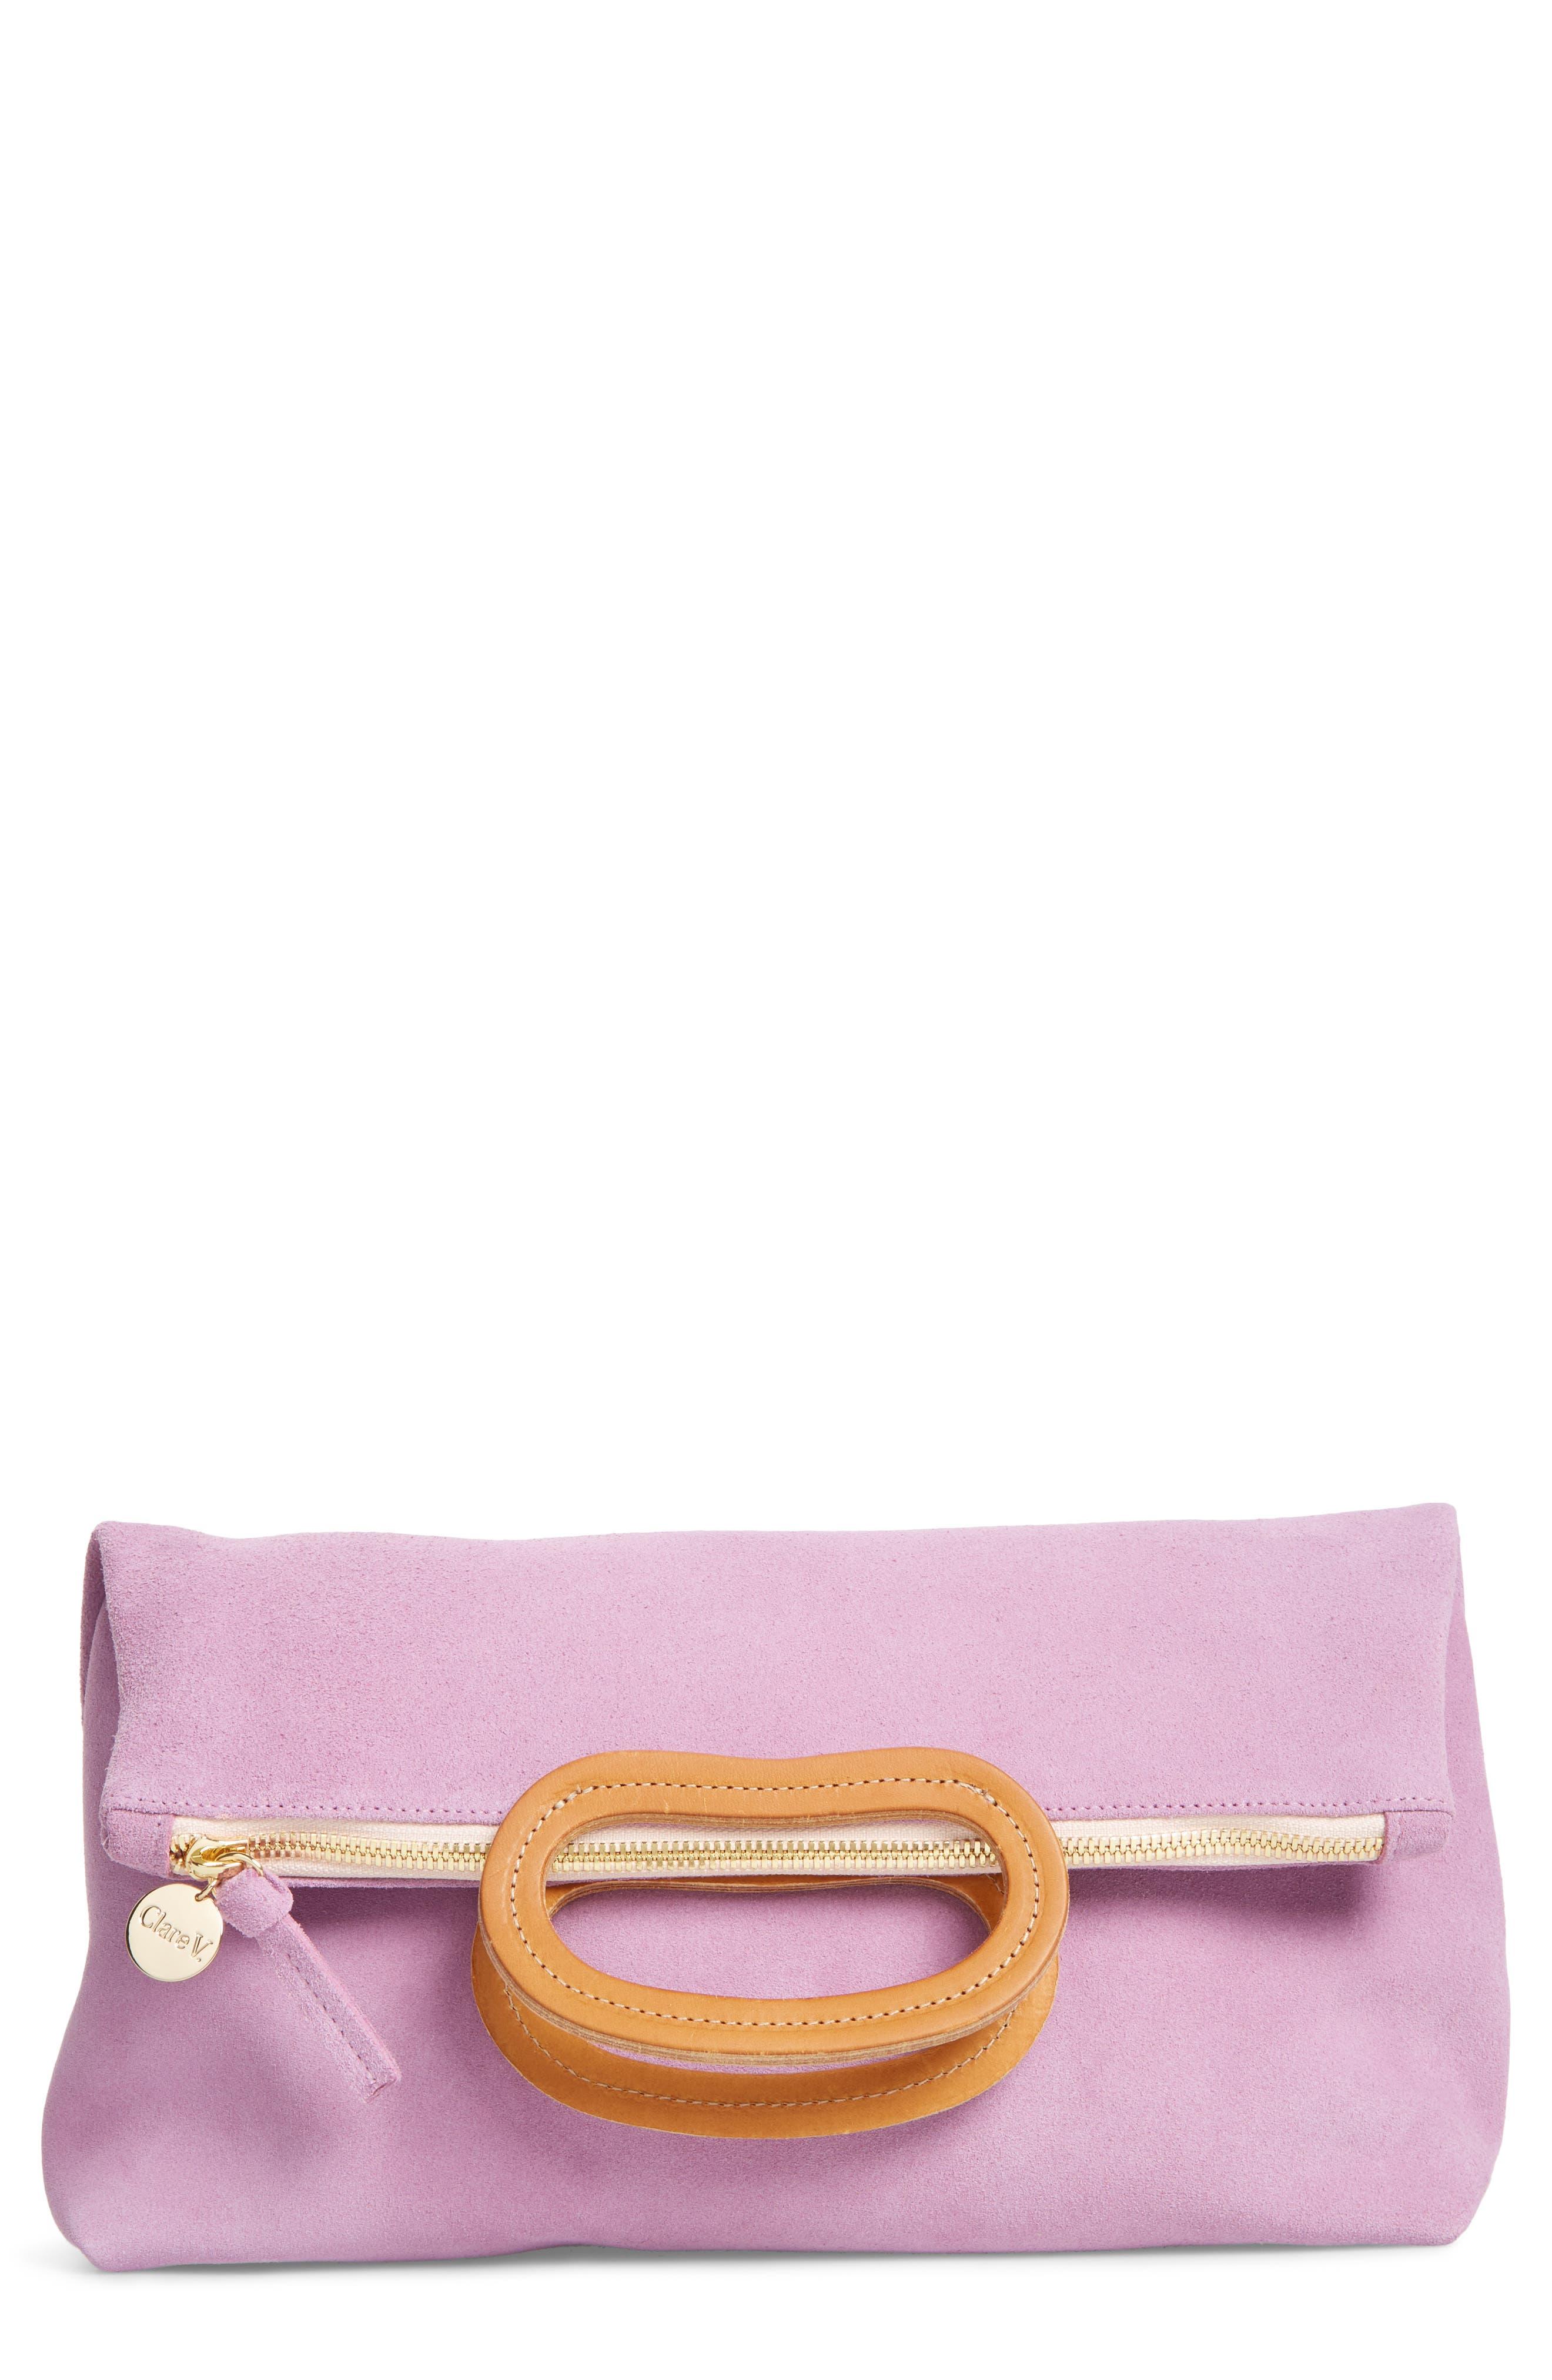 Marcelle Maison Leather Tote,                         Main,                         color, Lavender Suede